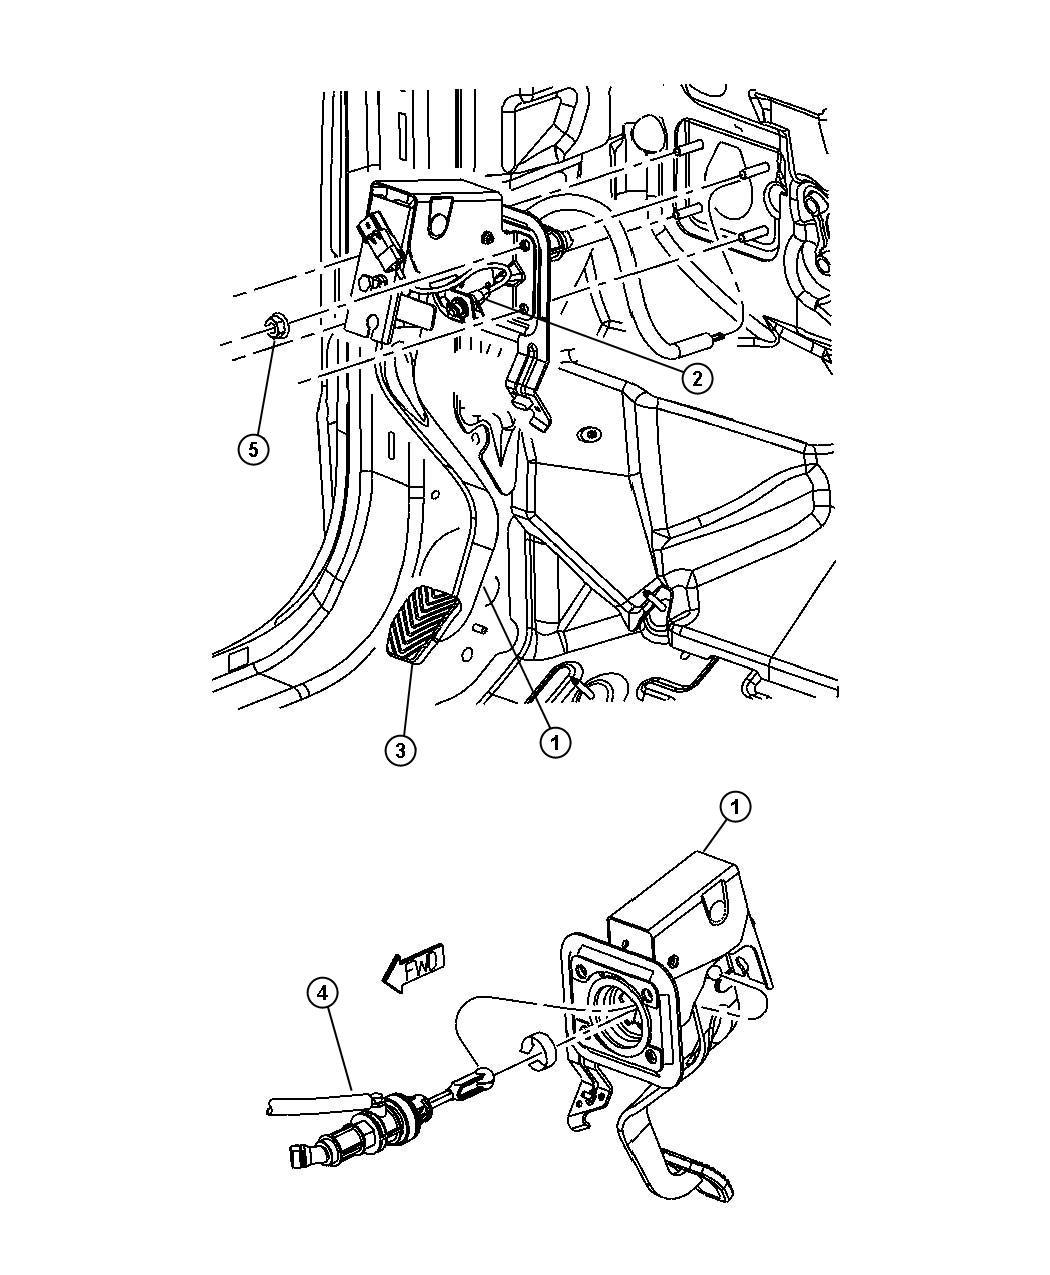 Dodge Caliber Pedal. Clutch. [6-speed manual aisin bg6